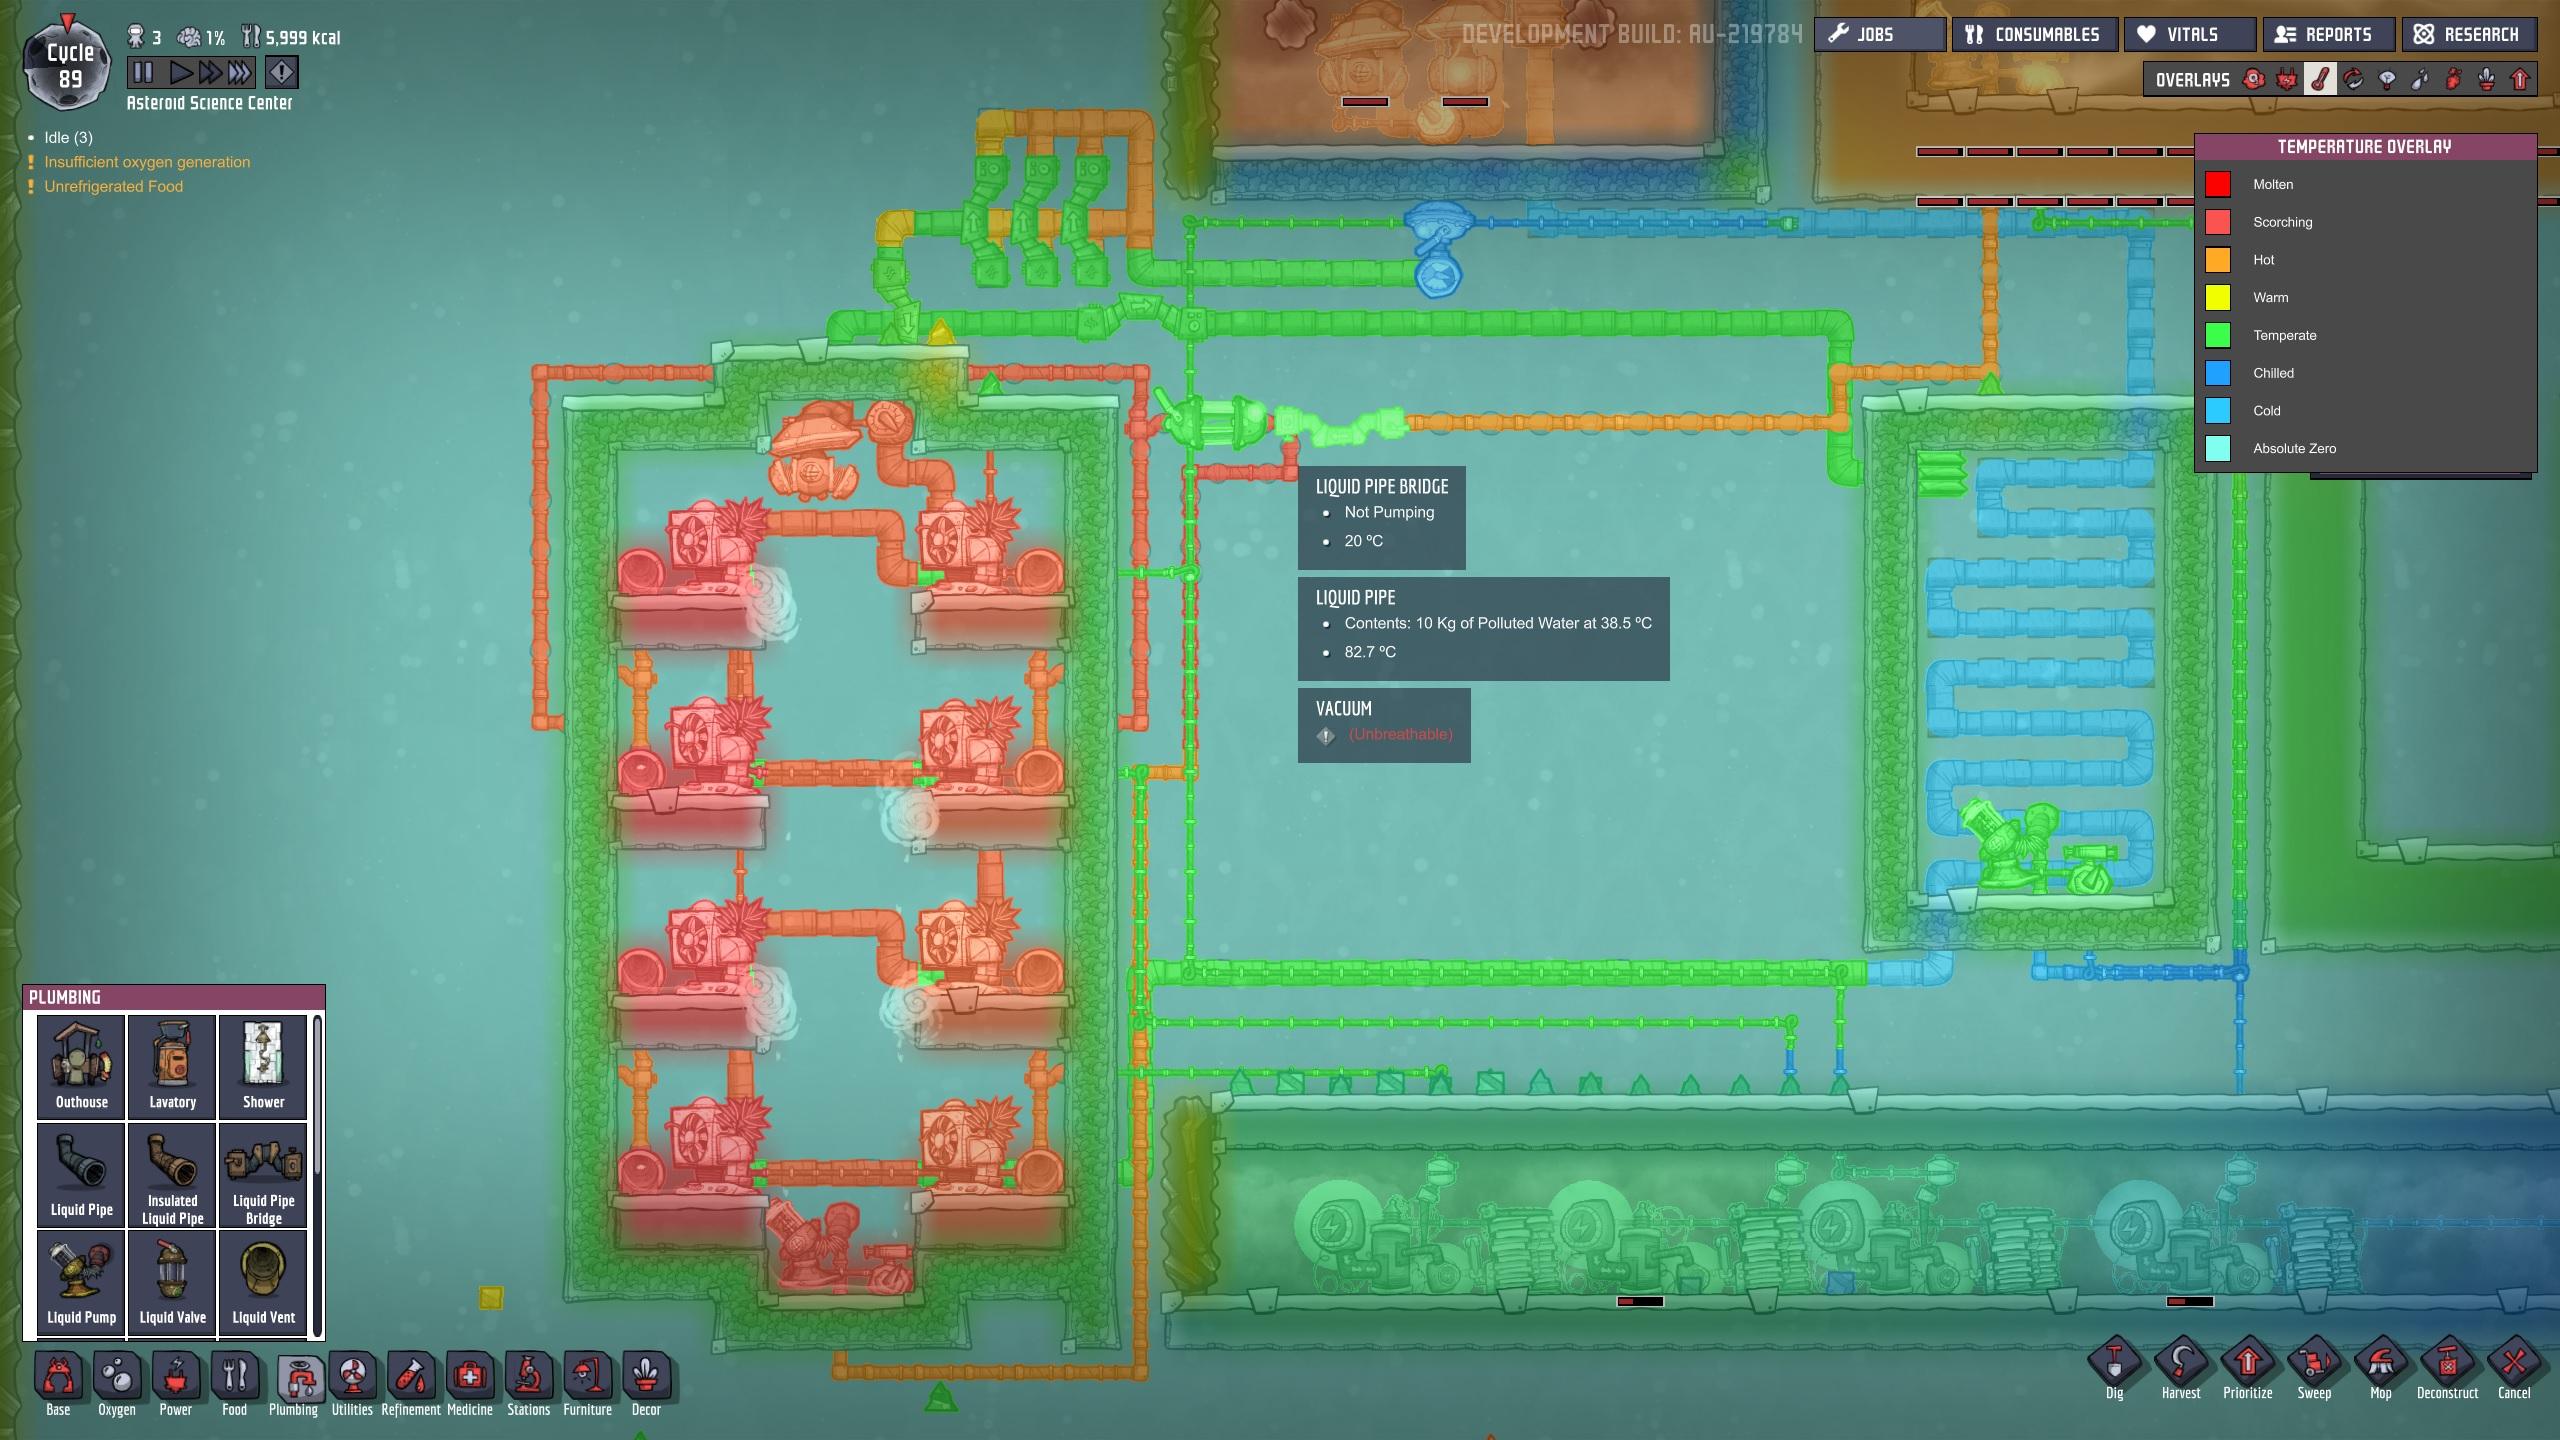 High performance boiler design - [Oxygen Not Included] - General ...